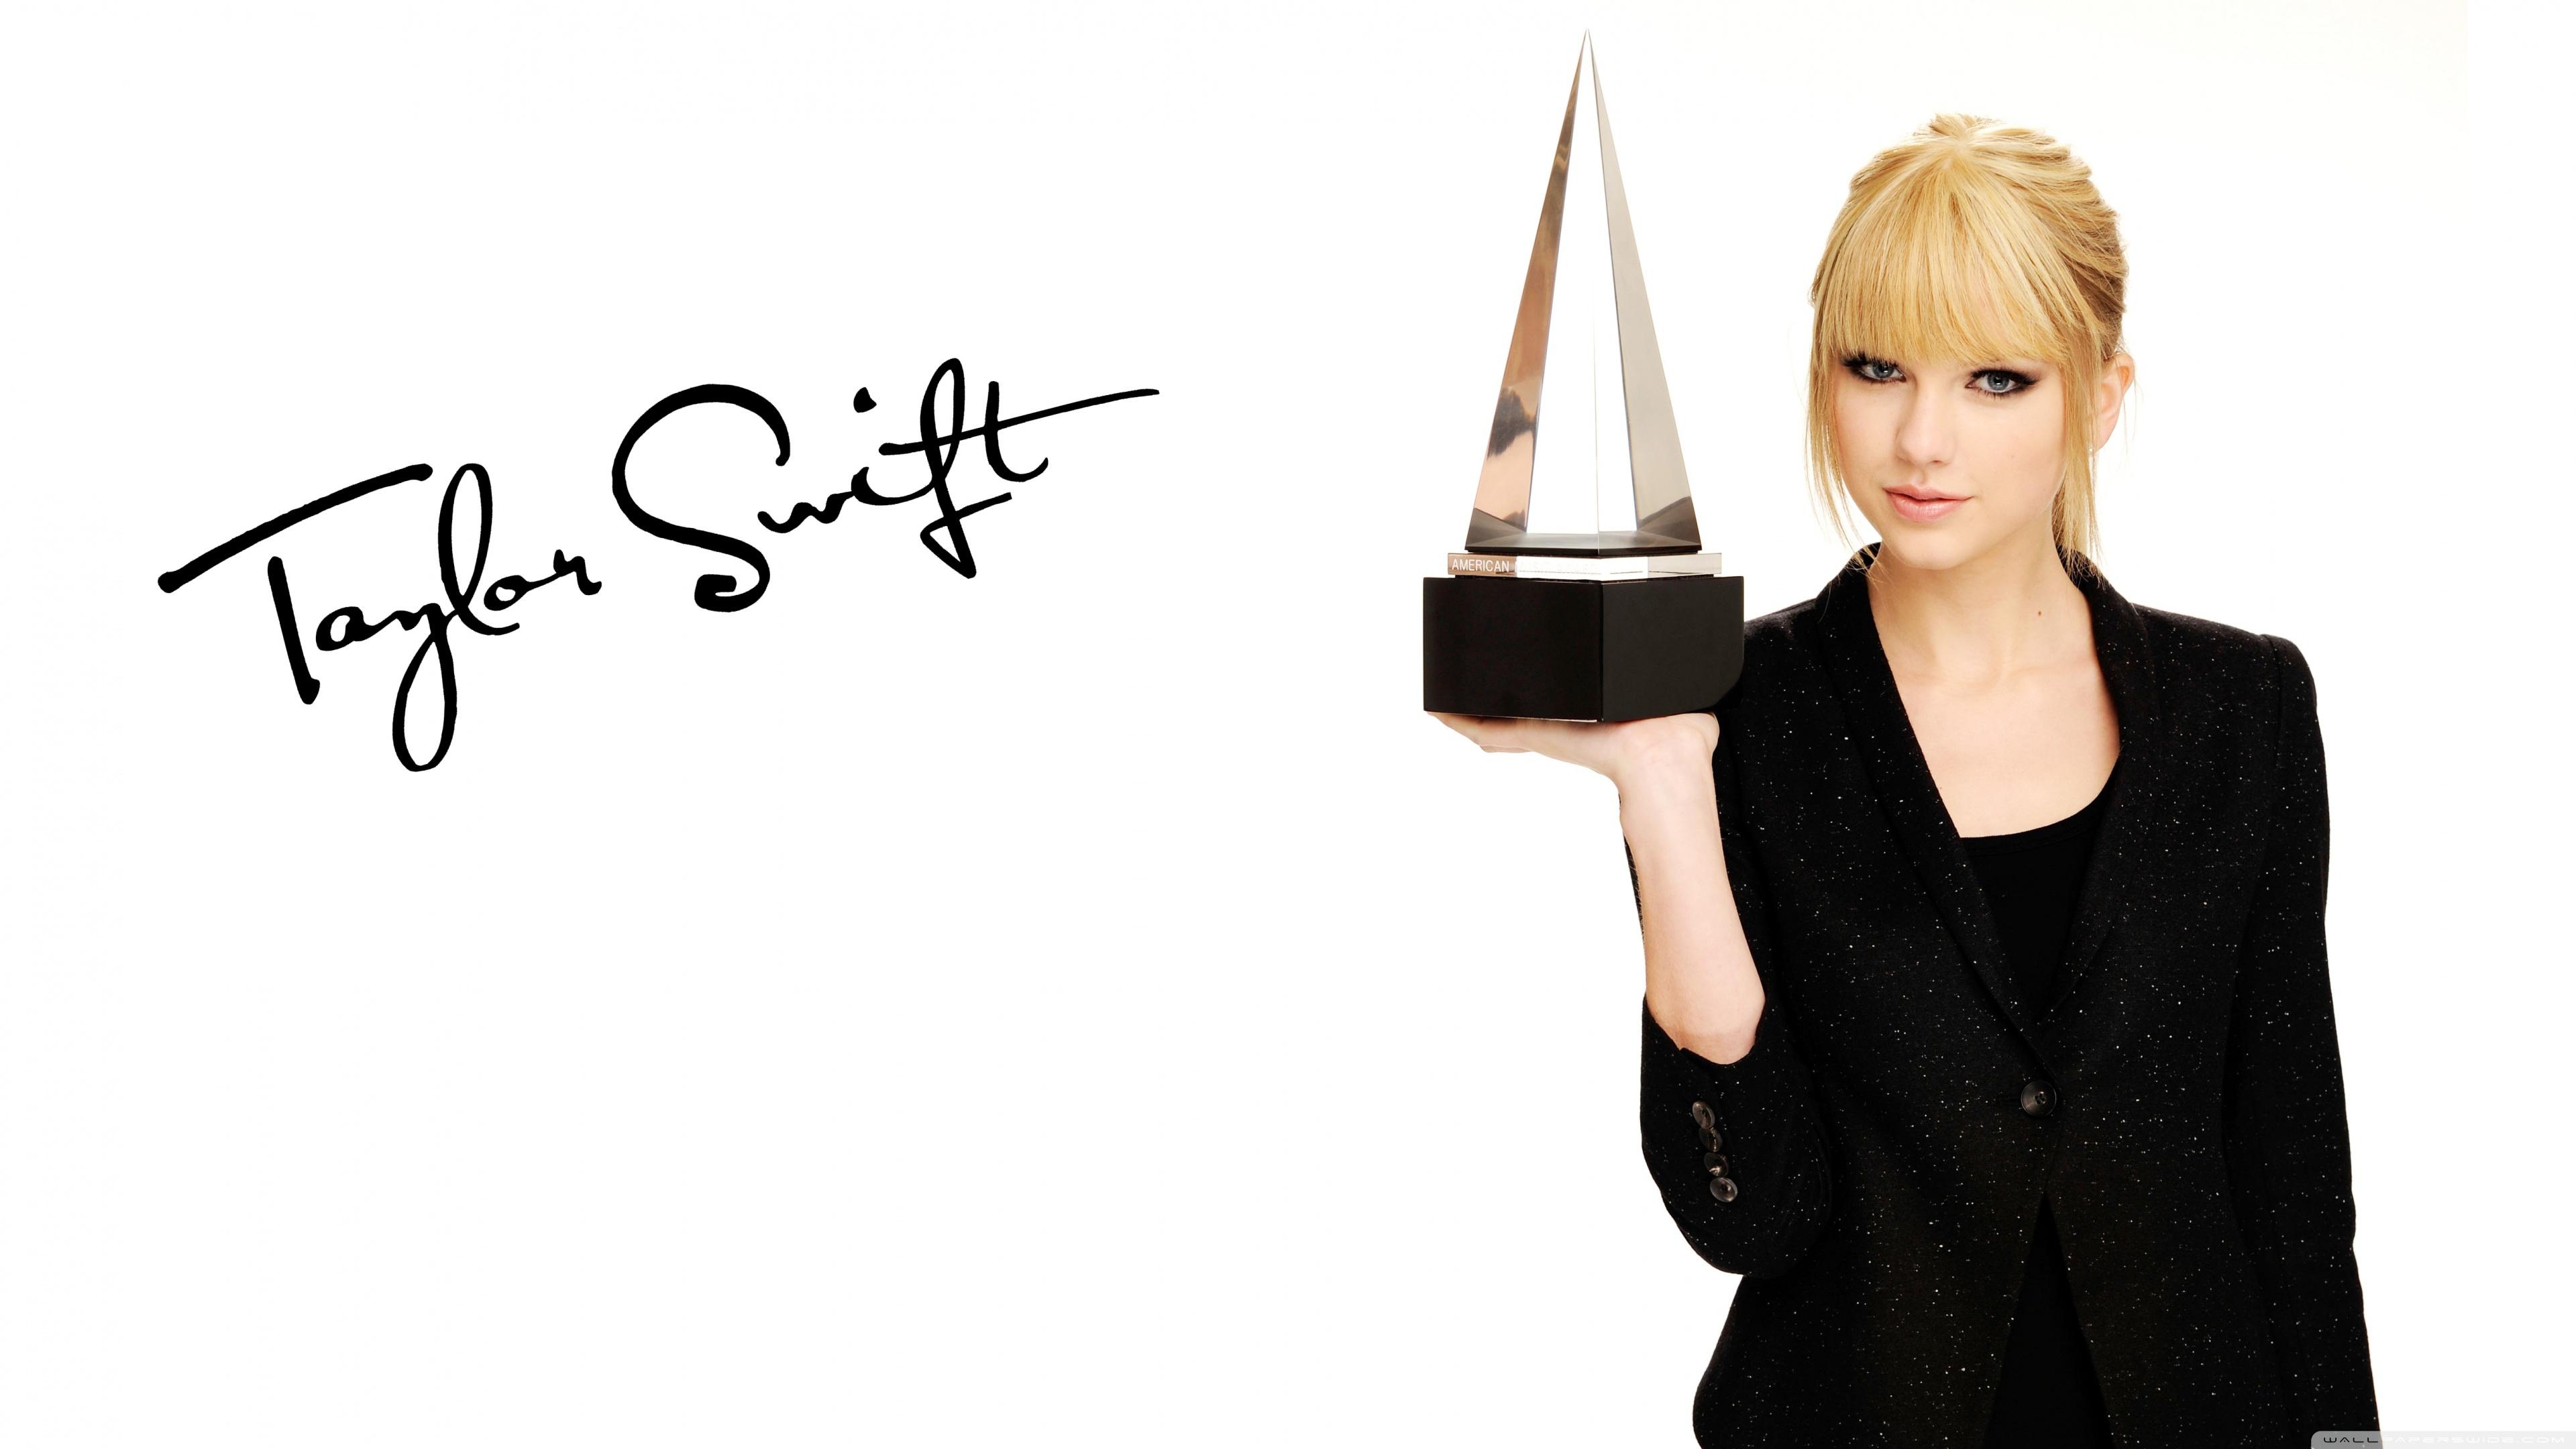 Taylor Swift American Music Awards 4K HD Desktop Wallpaper for 3840x2160